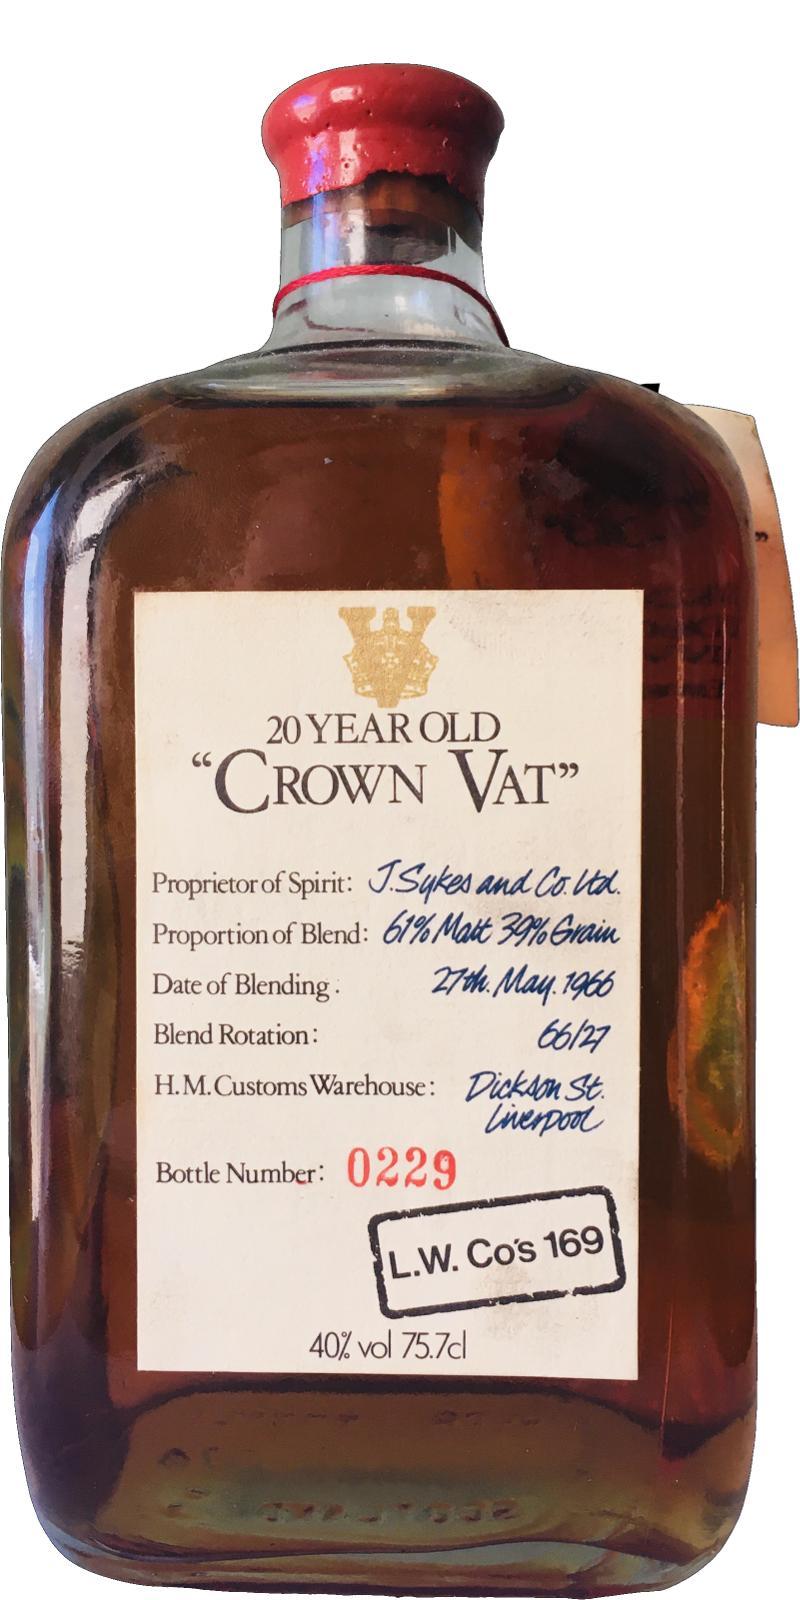 Crown Vat 20-year-old